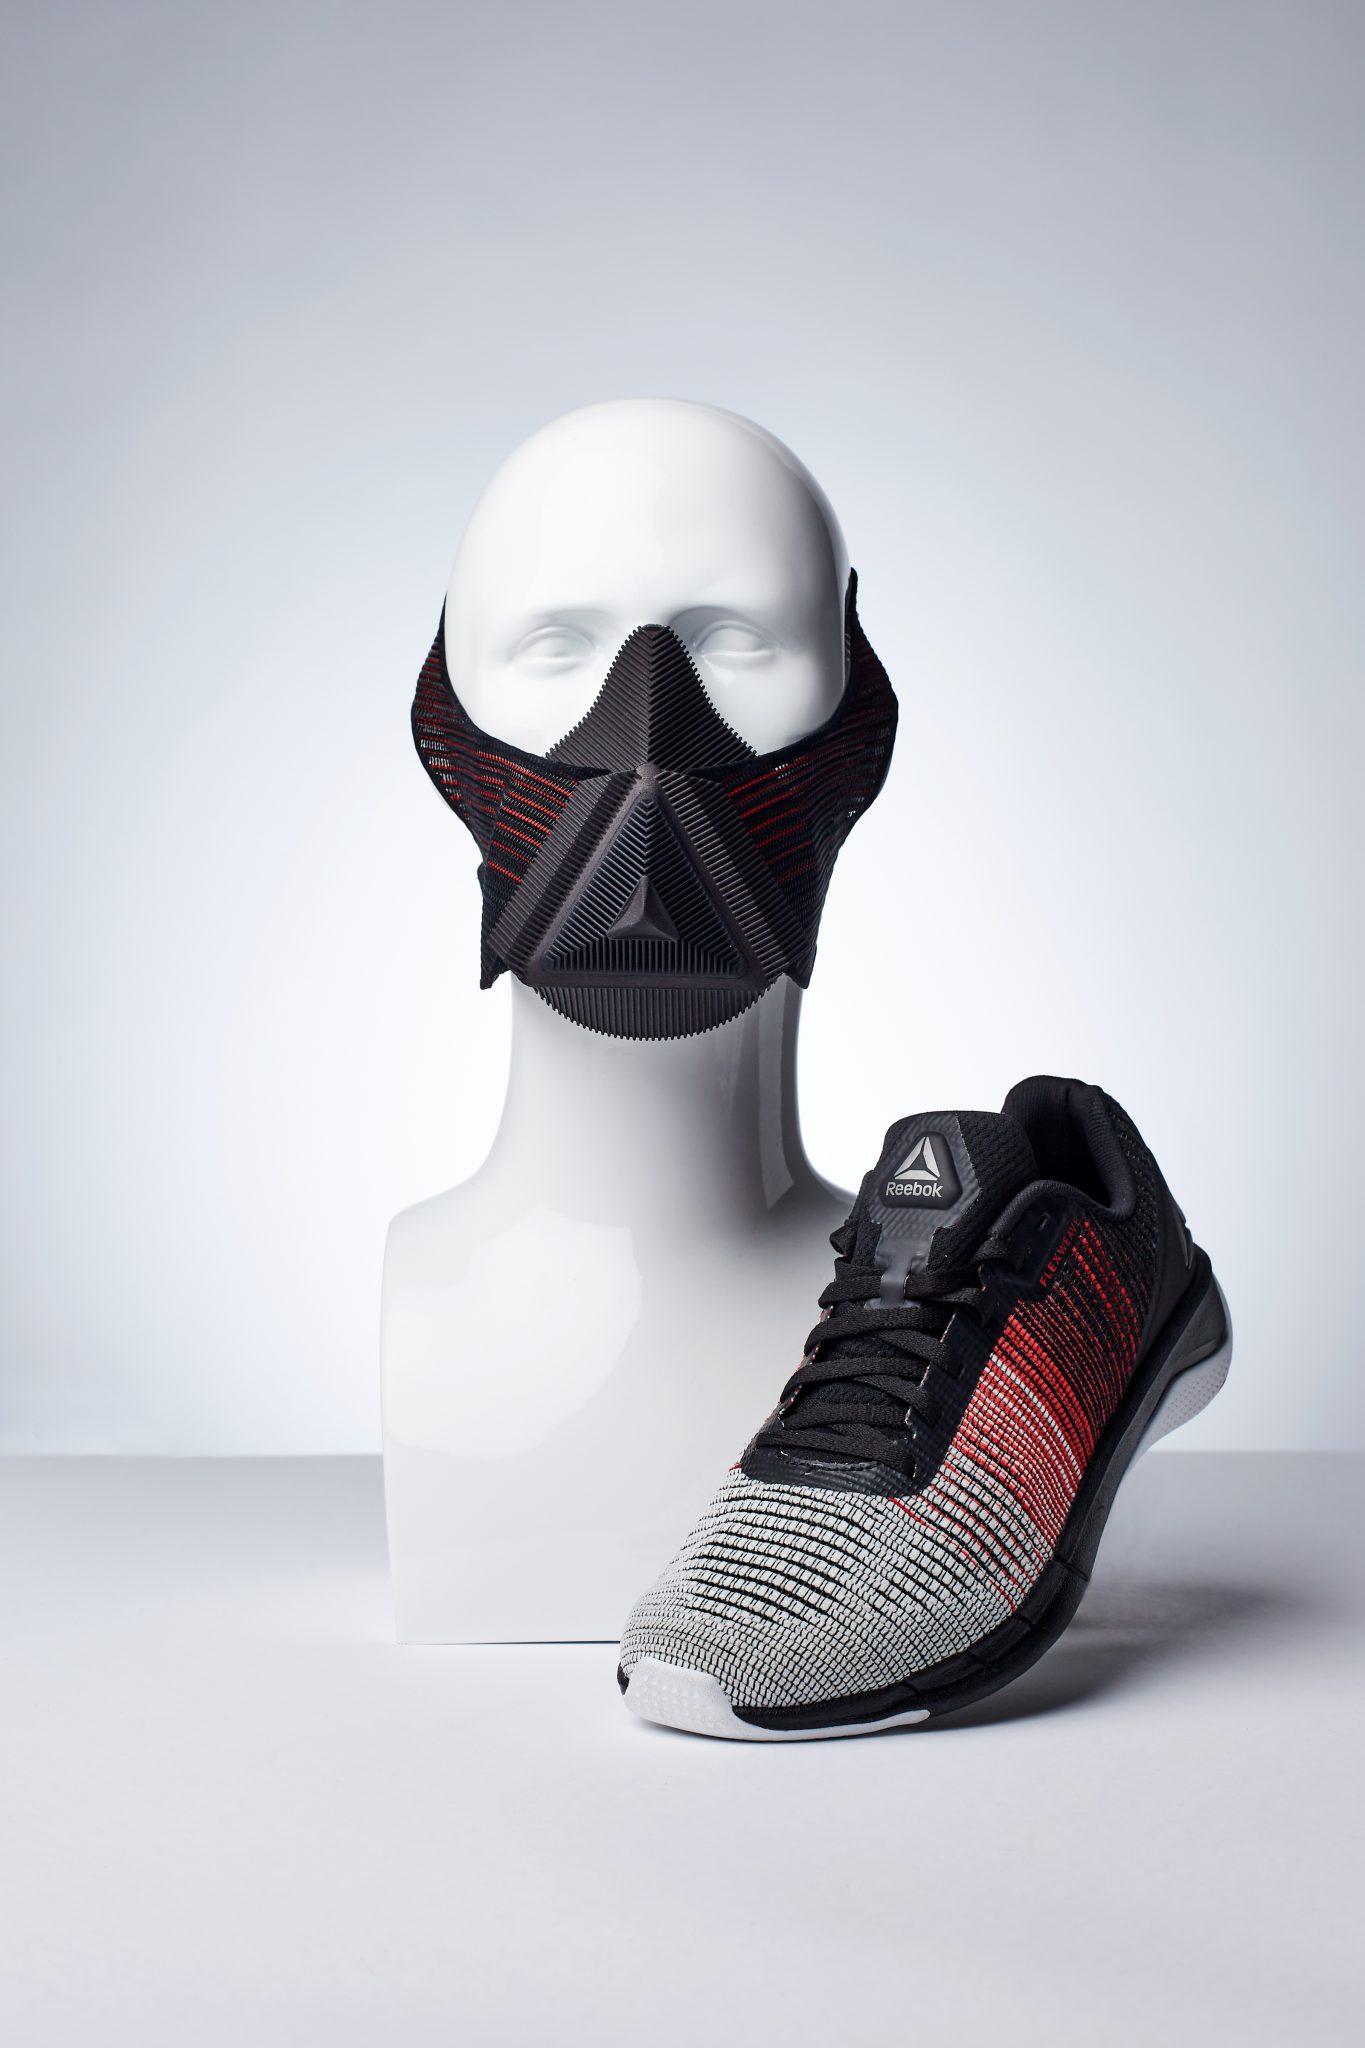 Interview Modla X Reebok 3d Printed Athlete S Mask 3d